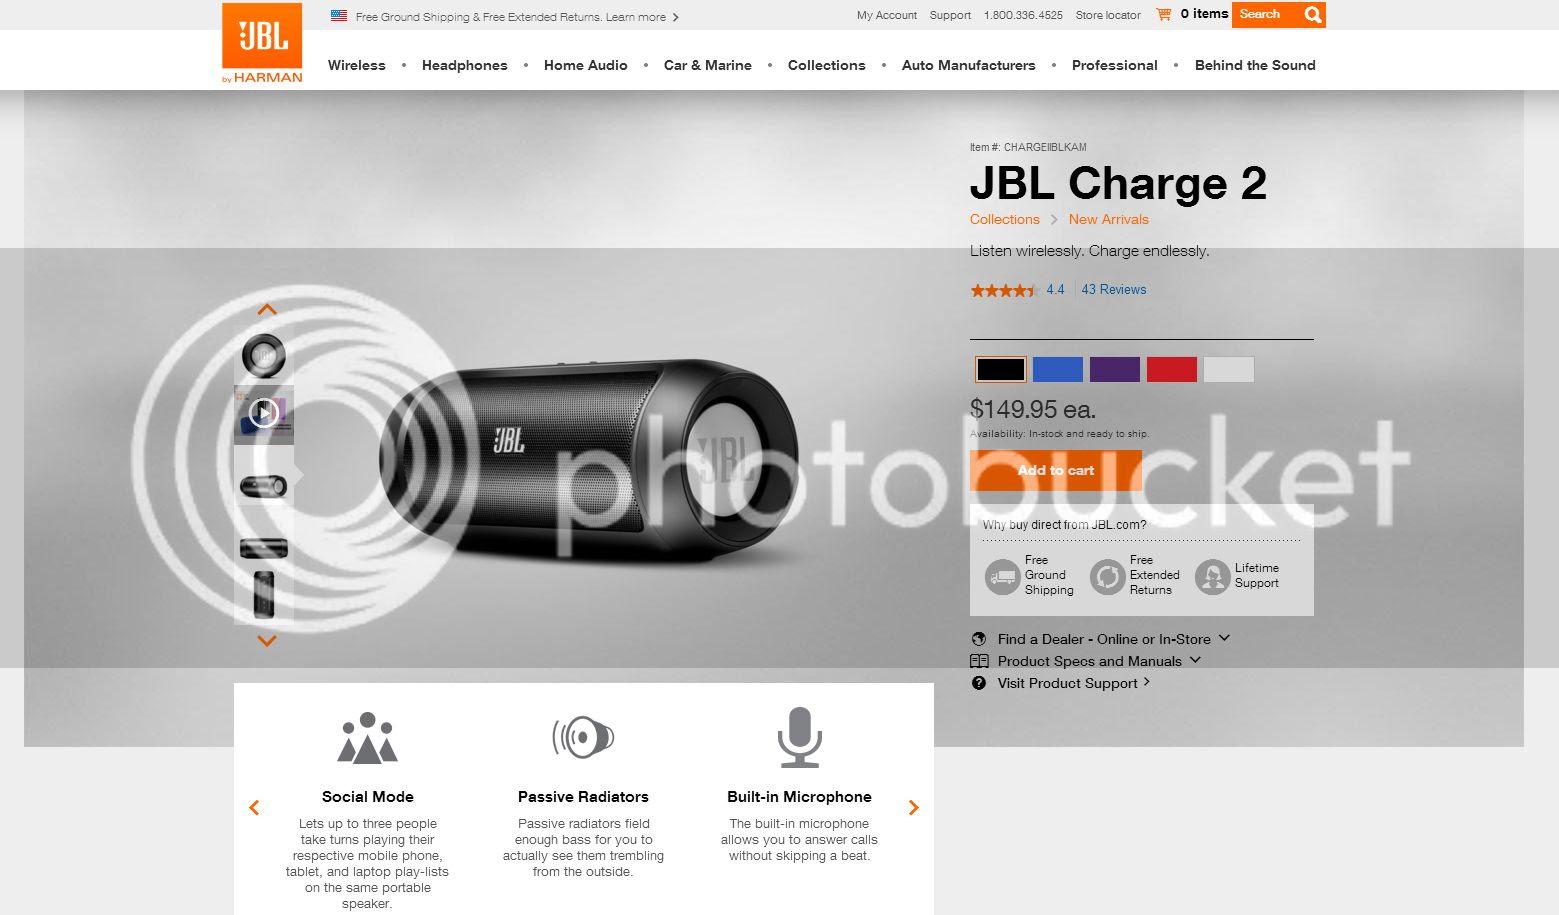 Wireless, Bluetooth, Portable, Speakerphone, Battery Life, #GiftingAudio #CollectiveBias